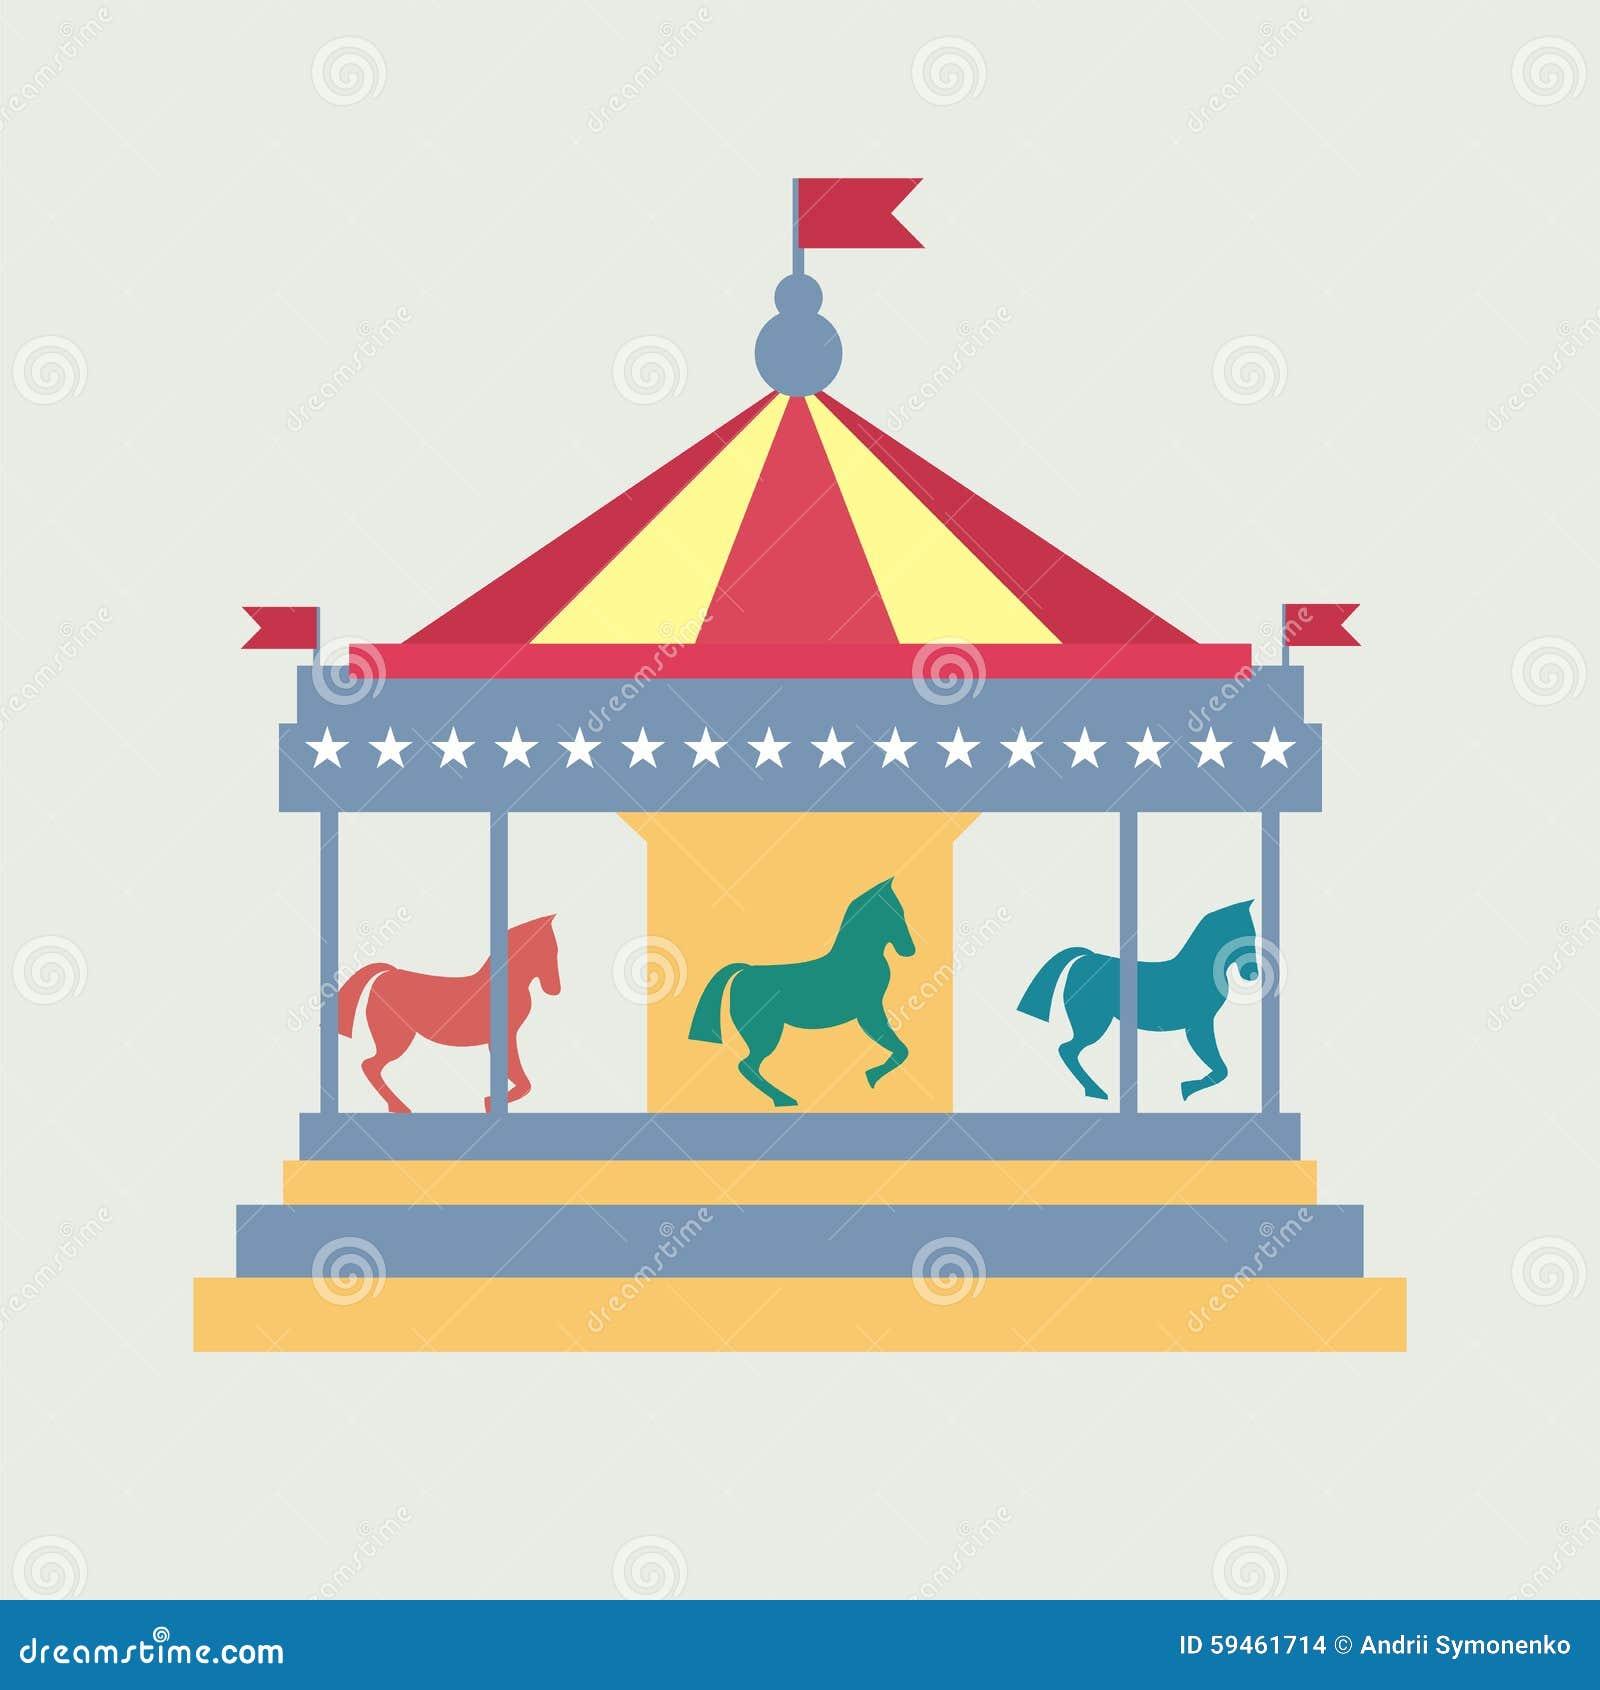 merry go round horse template - vintage merry go round carousel vector stock vector